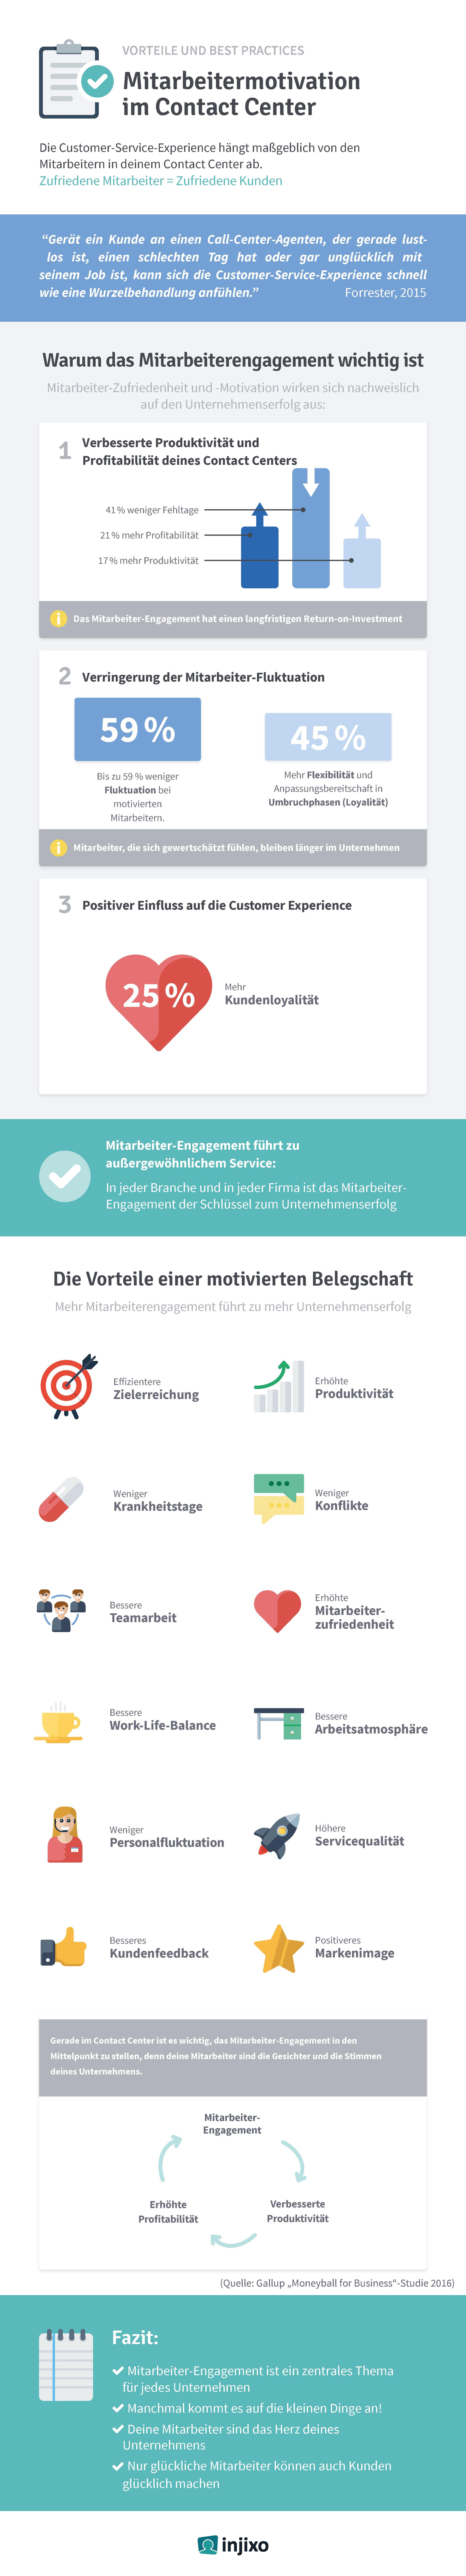 injixo_blog_infographic_mitarbeitermotivation_im_contact_center.png